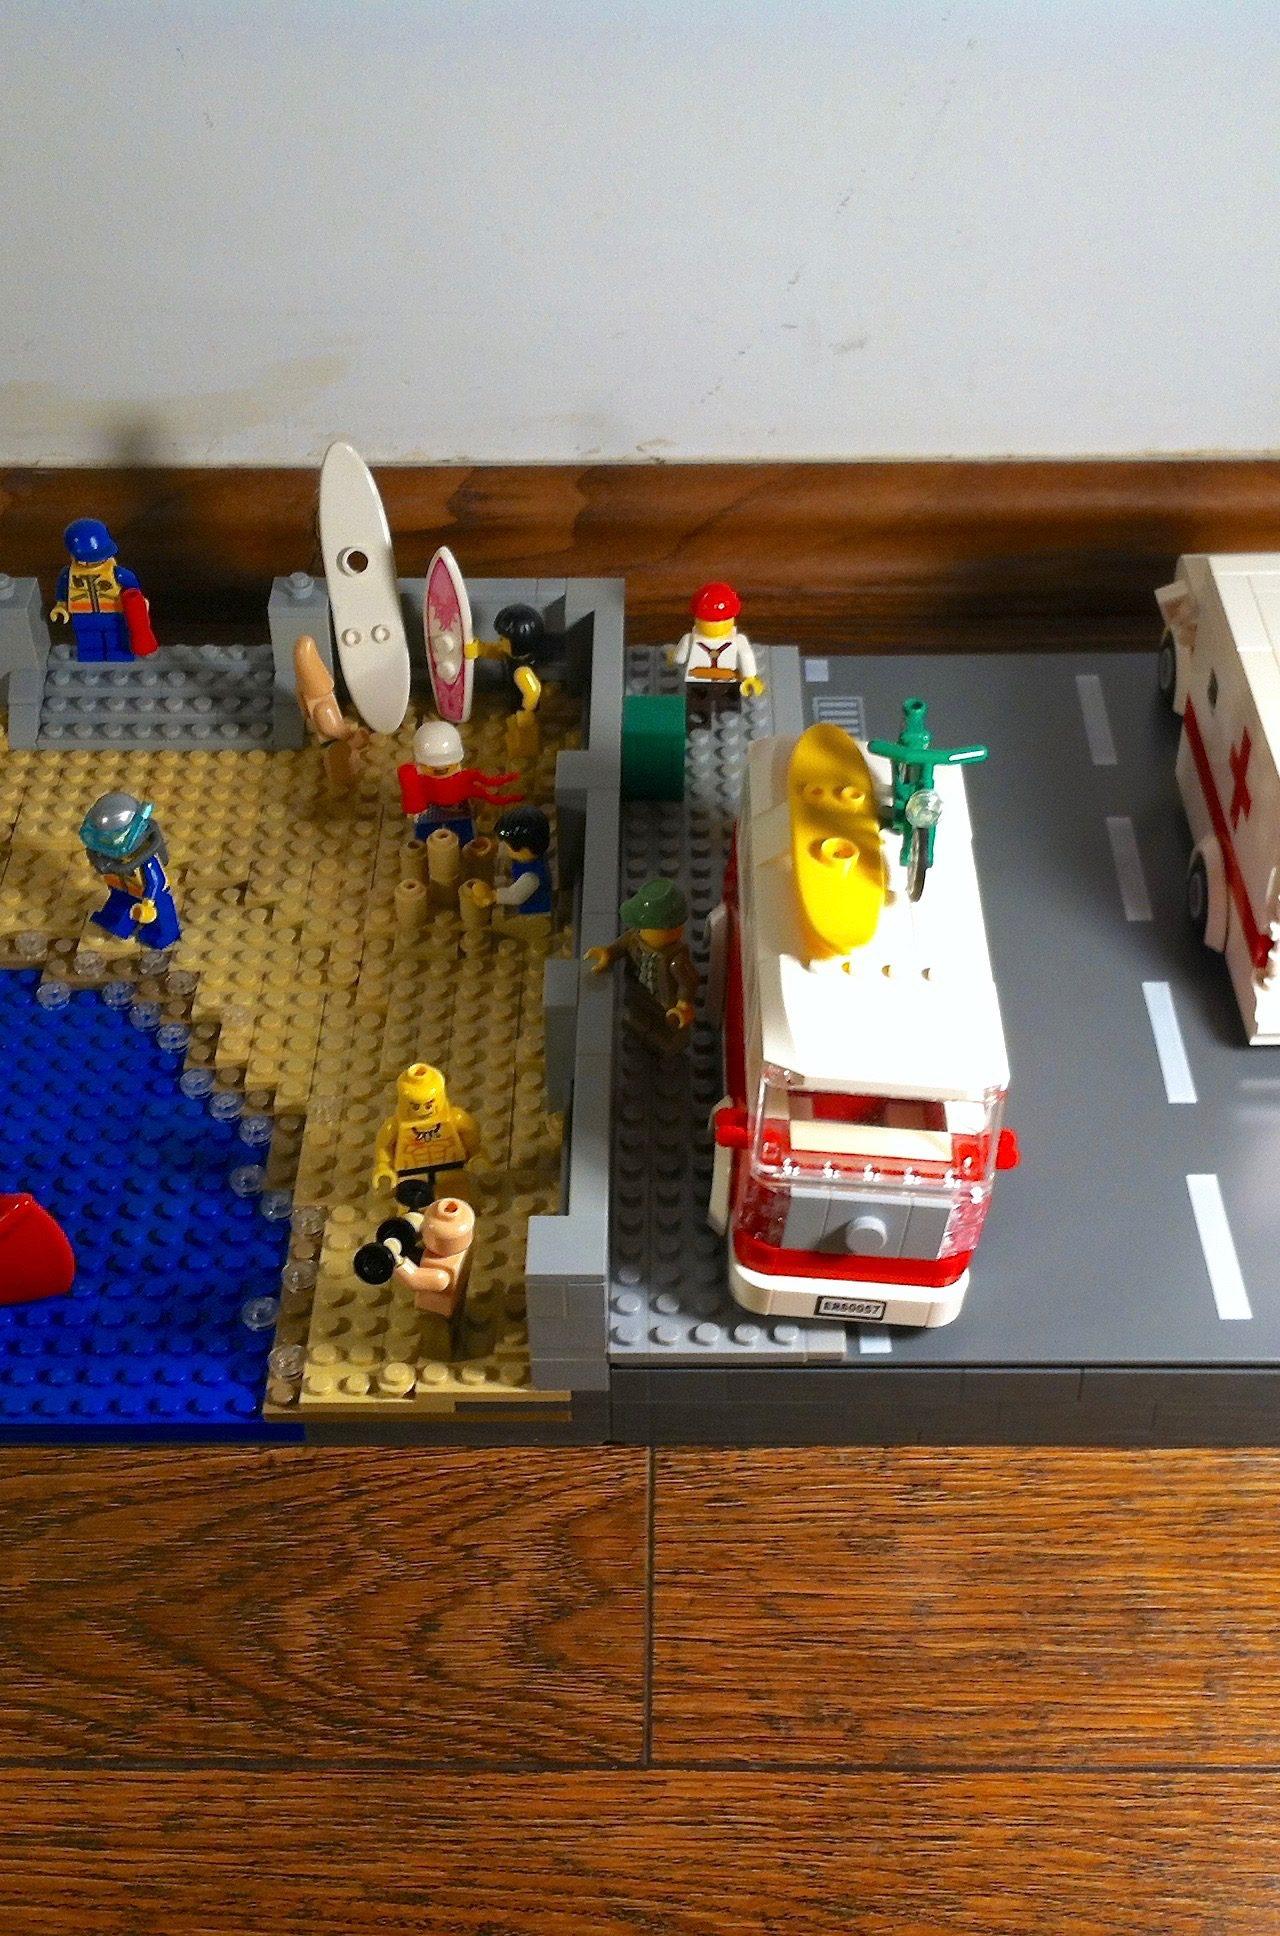 Concurs My Dream Life – Creatia 8: Plaja mea de vis